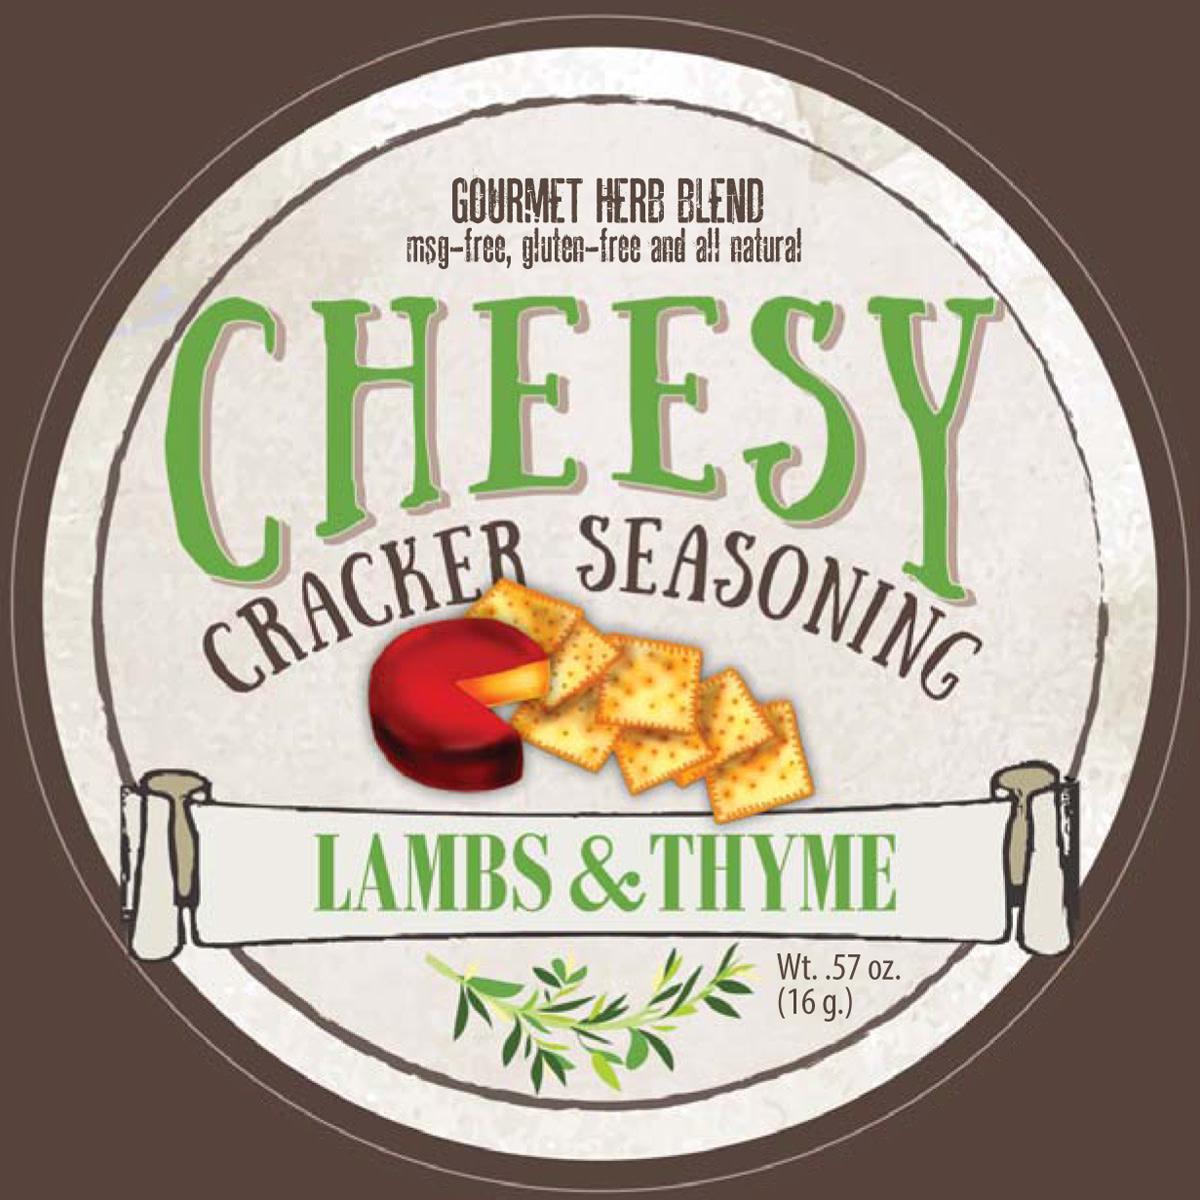 Lambs & Thyme Cracker Seasoning Cheesy